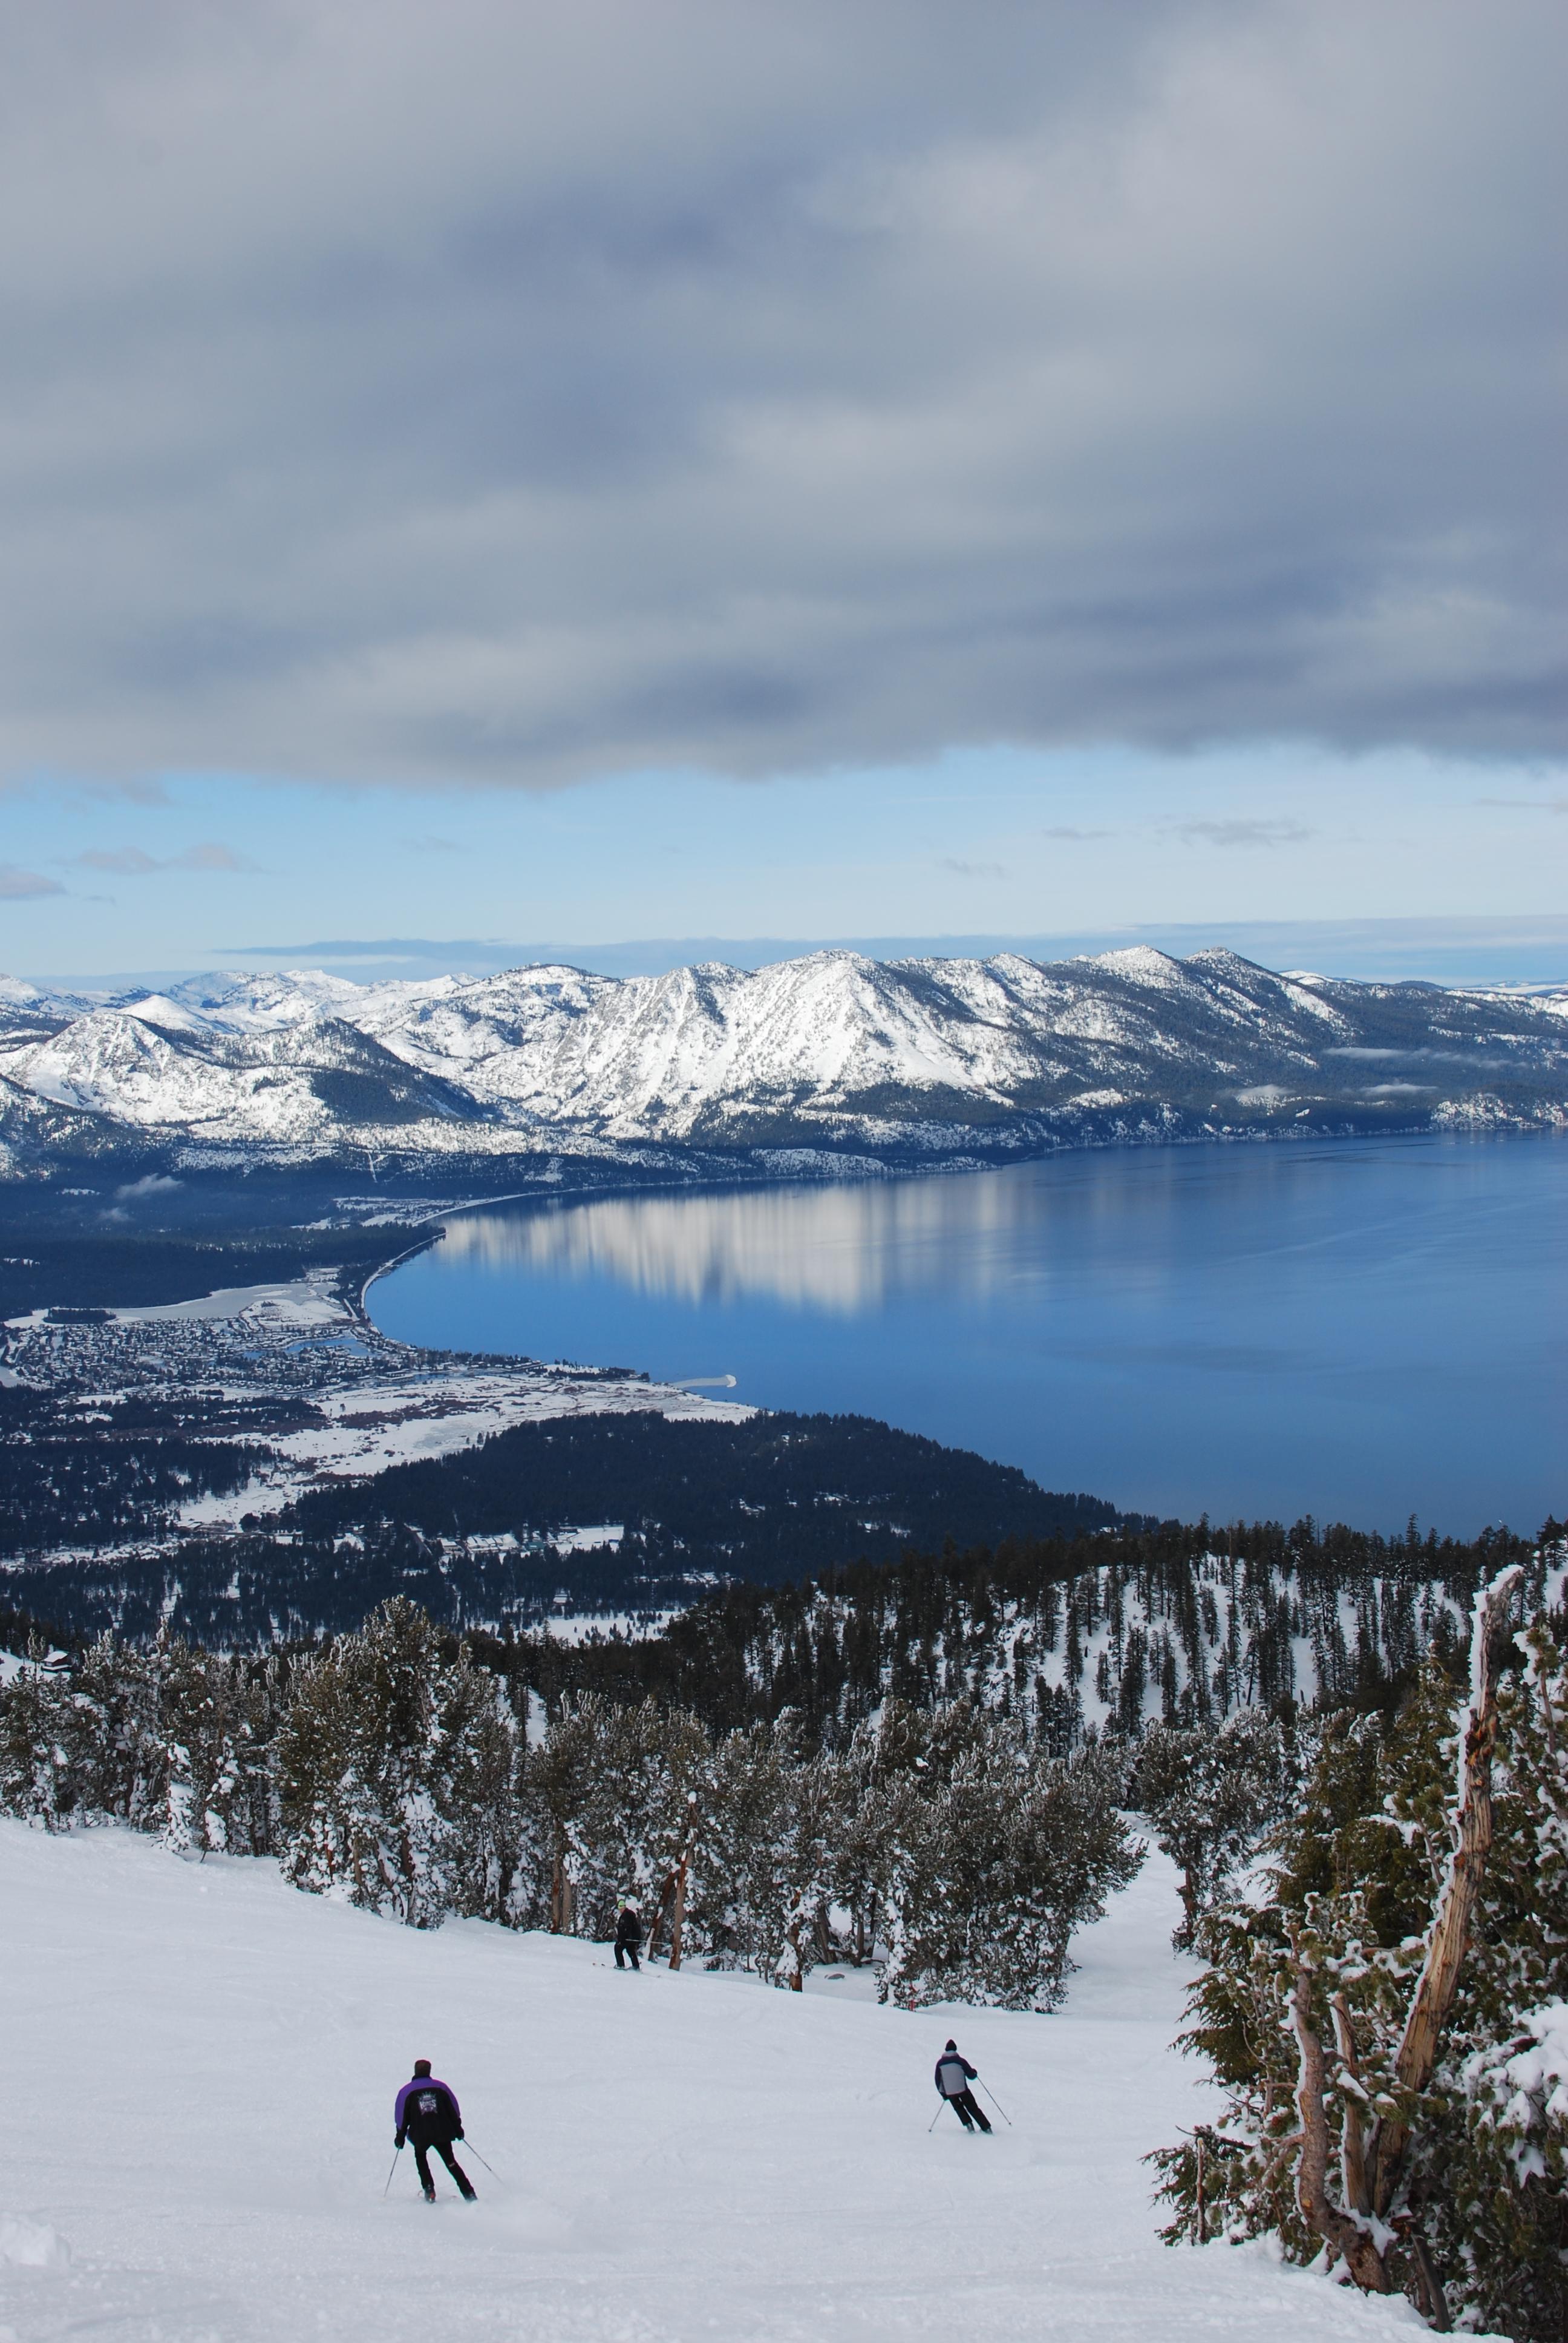 Best Hotels Near Heavenly Ski Resort